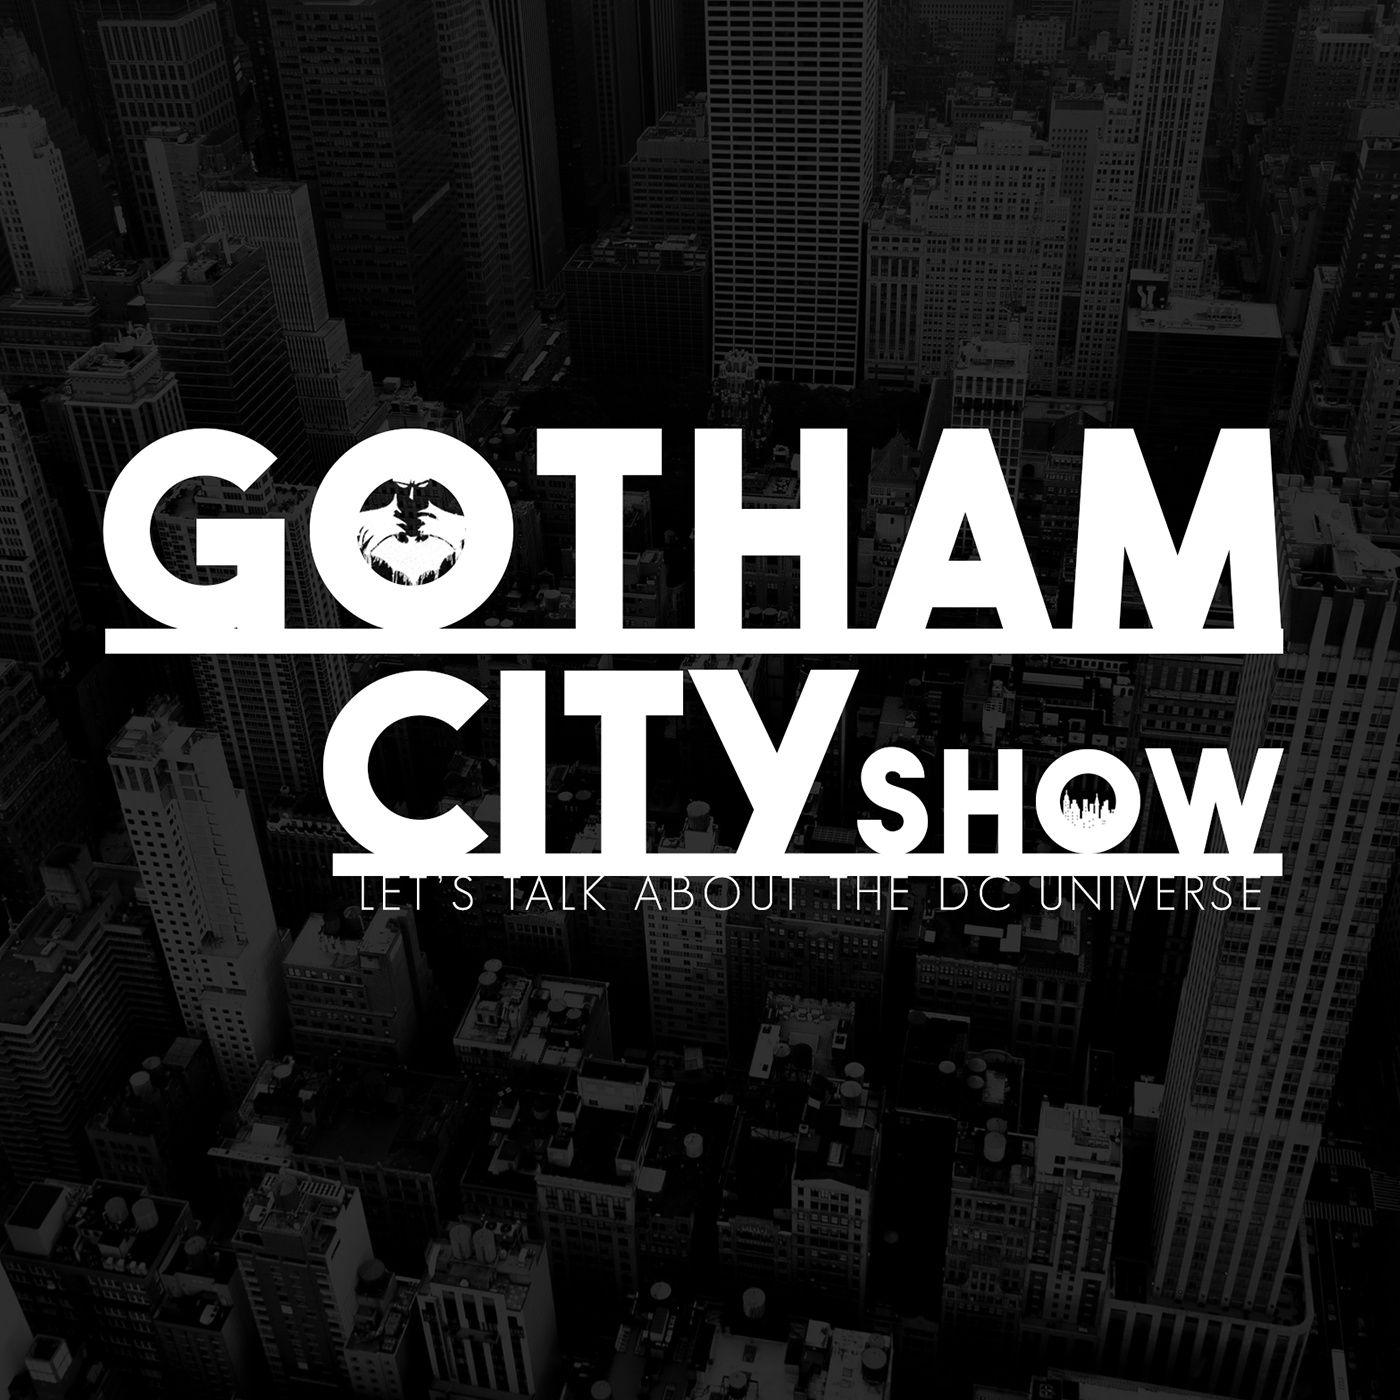 Gotham City Show: DC Universe